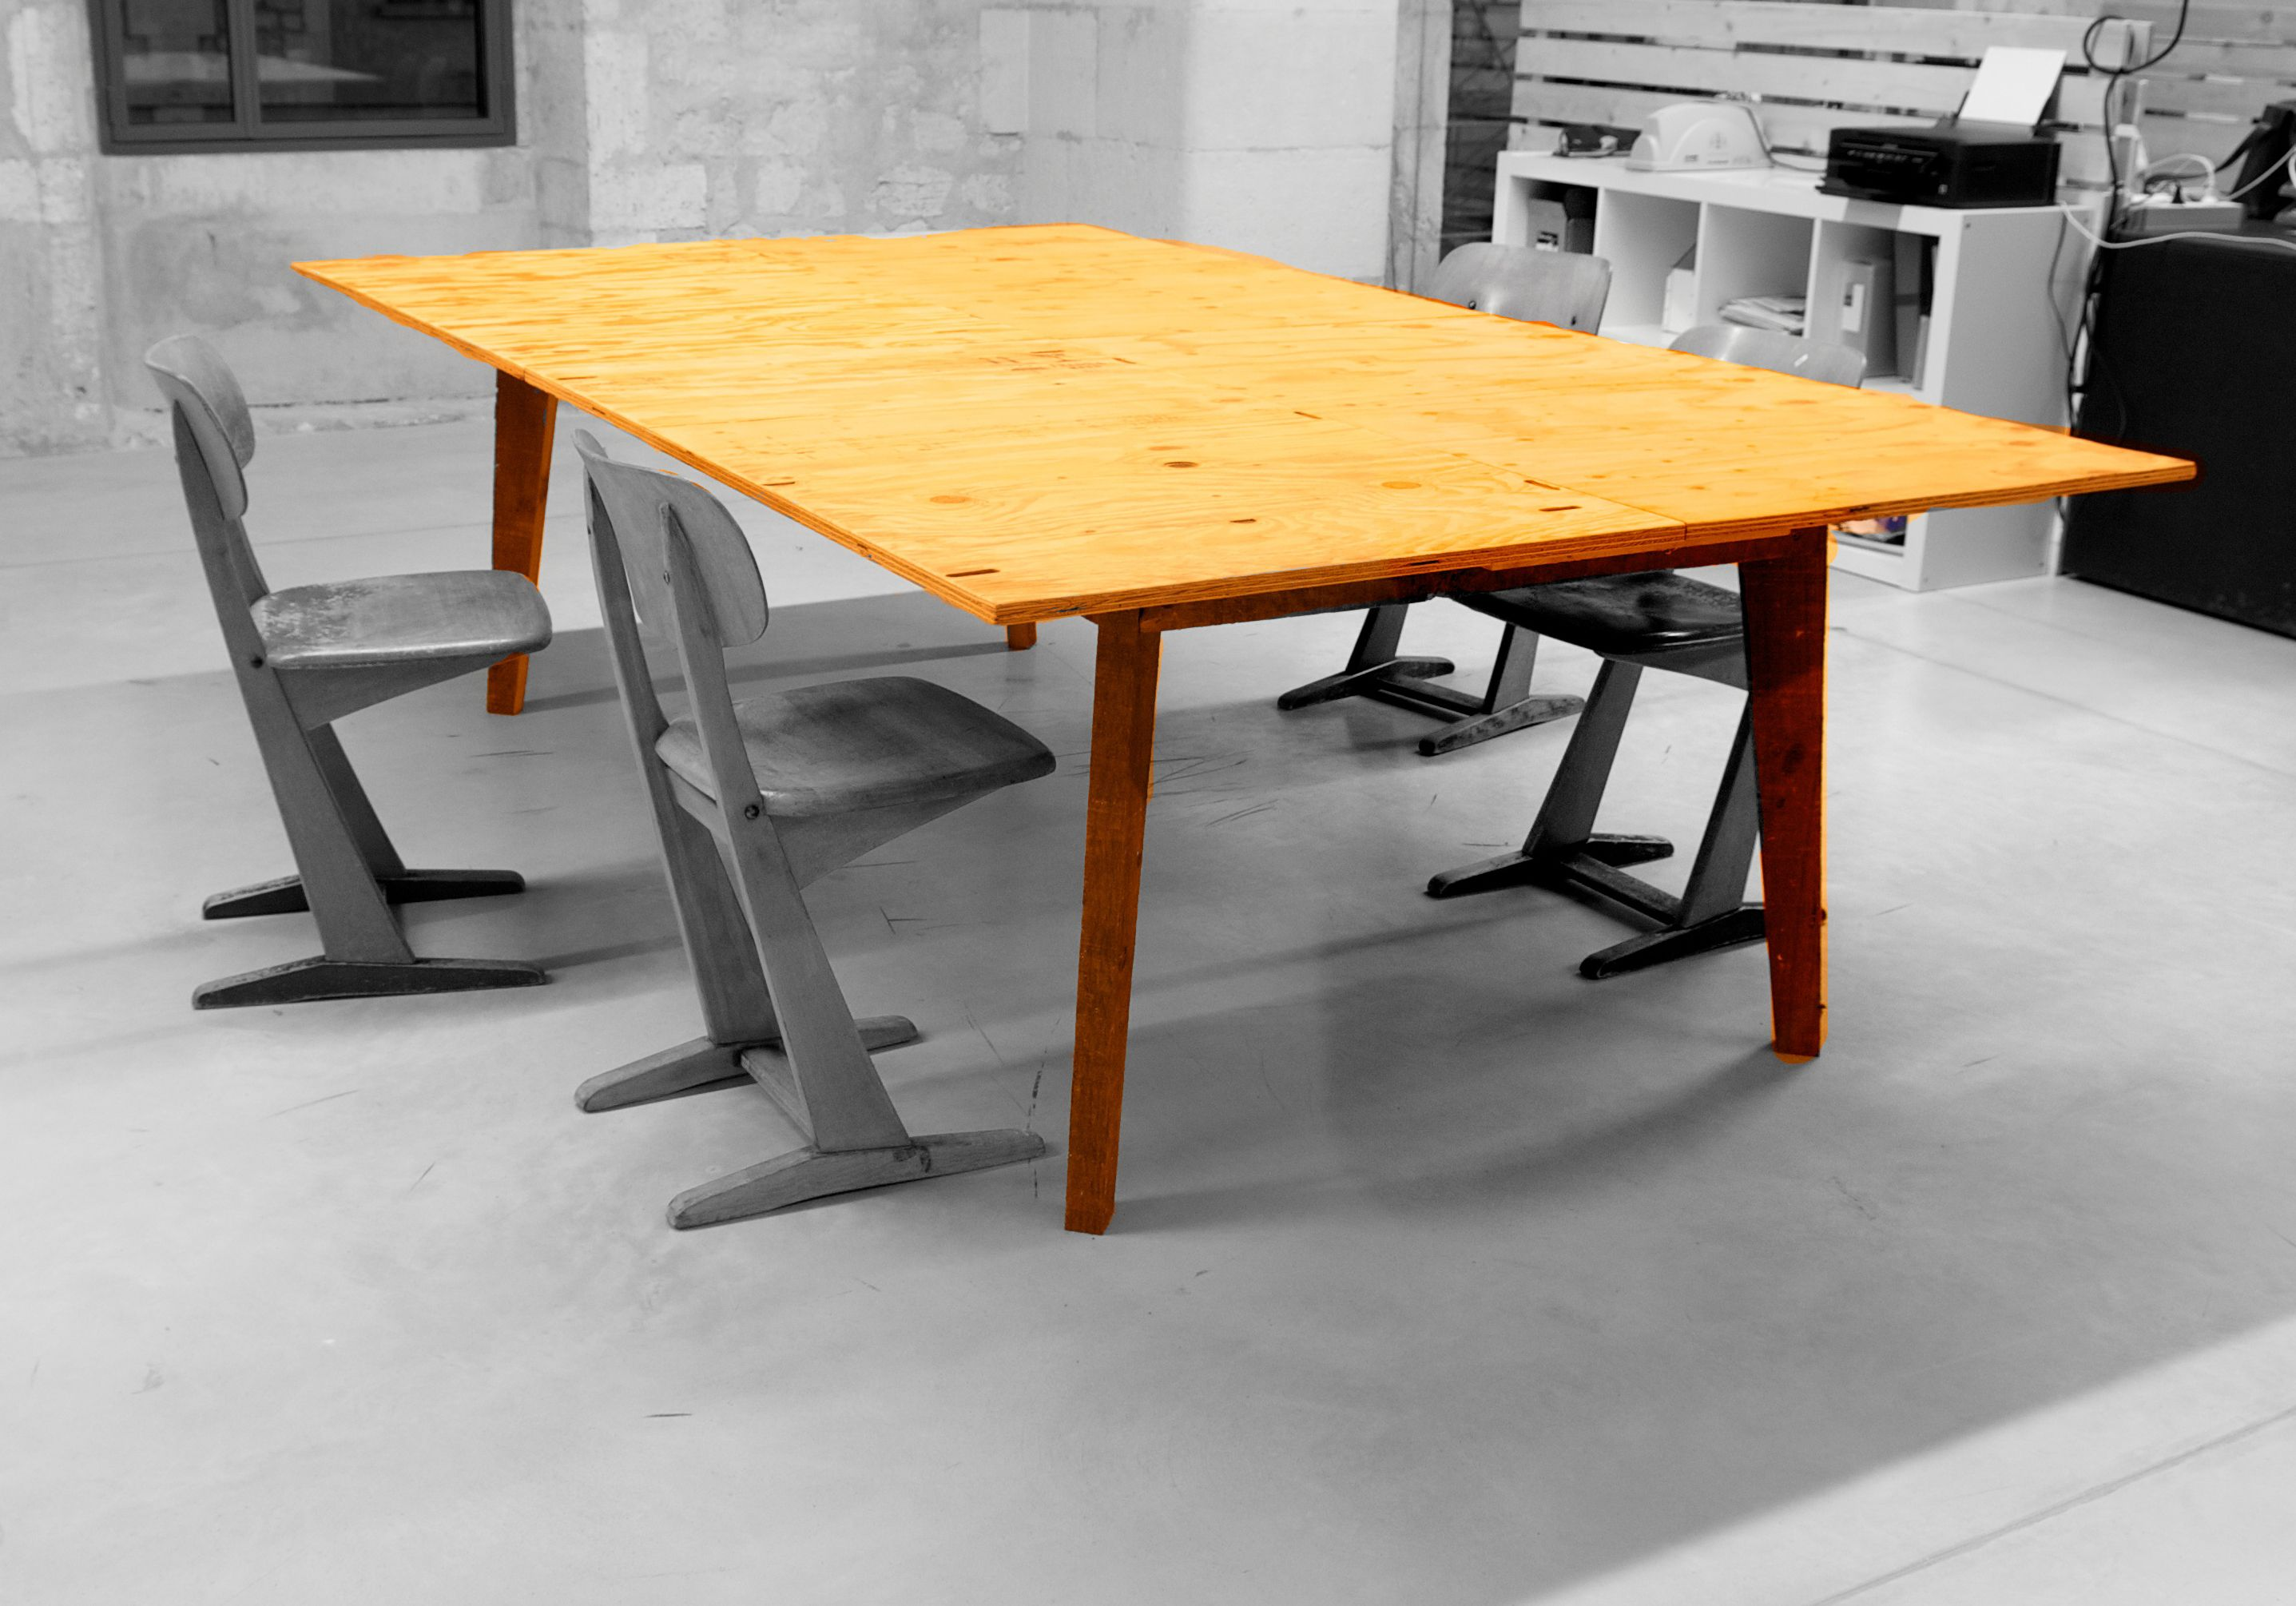 Le bureau cavour inspire par carlo mollino from designer carlo